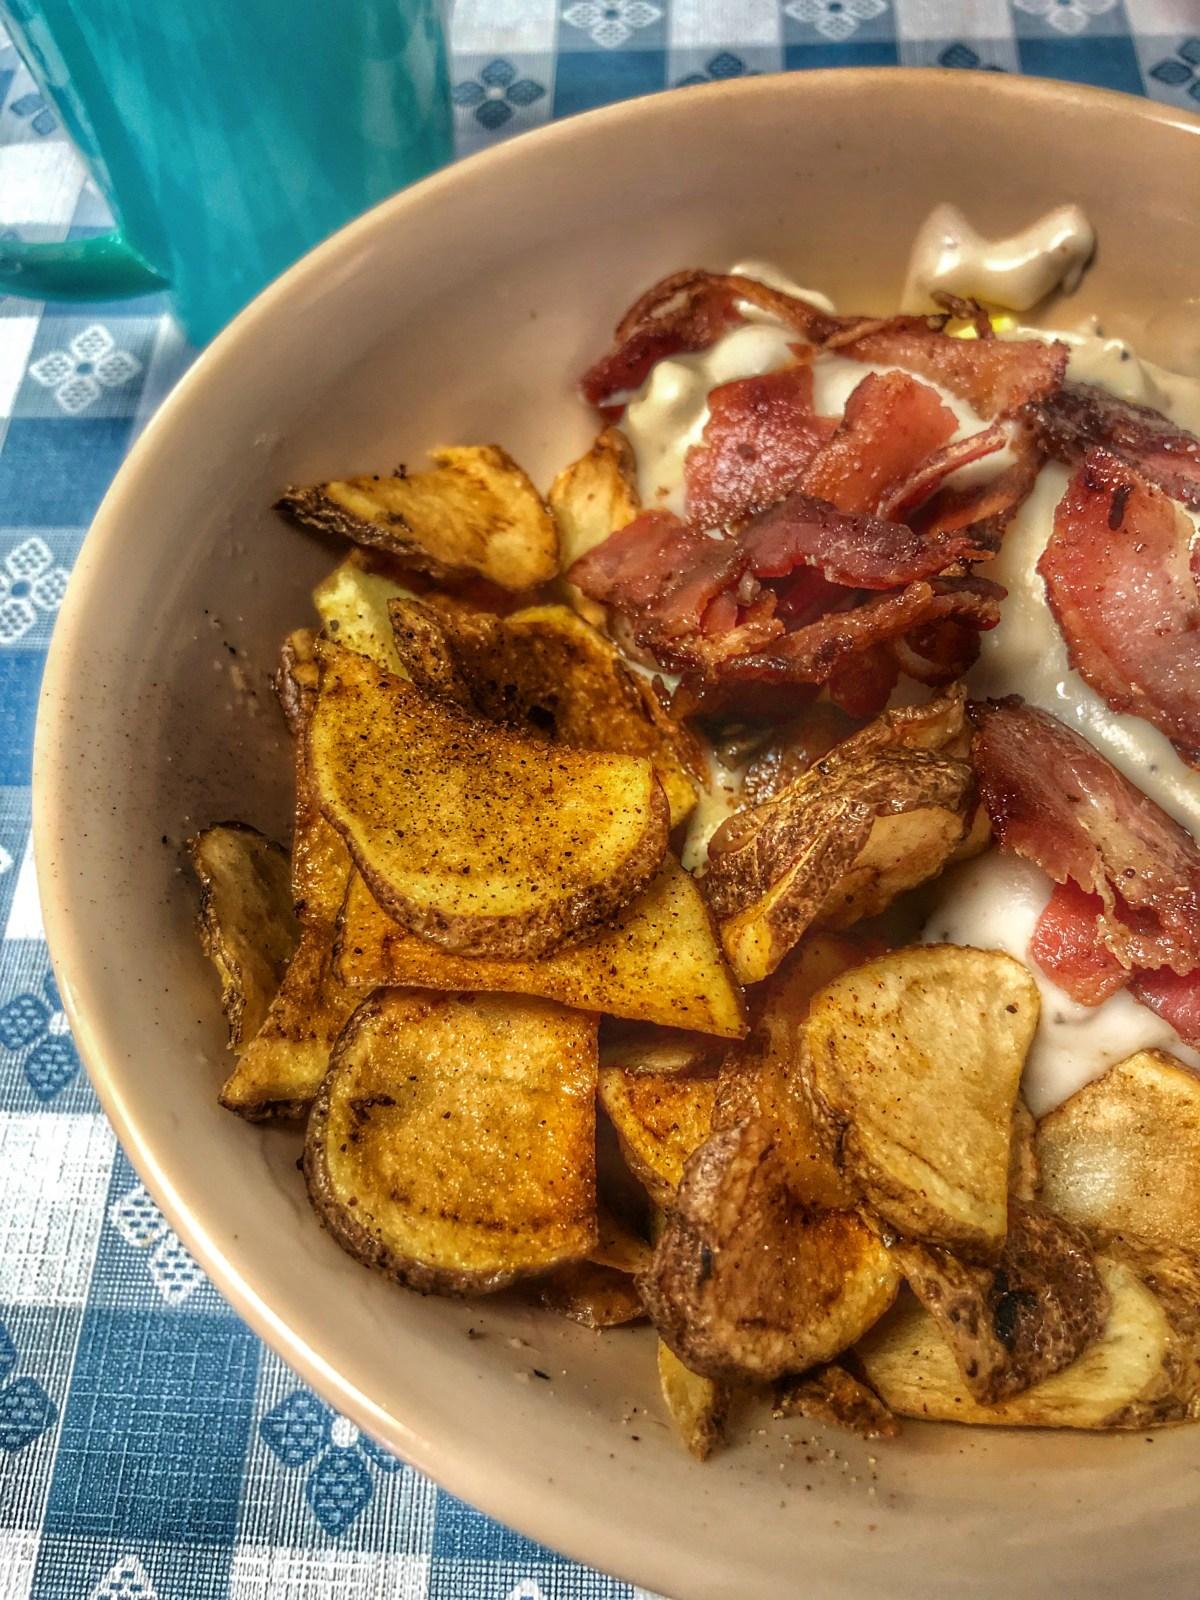 Bacon Breakfast Bowl at Lynchburg Fixins #lynchburgfixins #jackdanielsdistillerytour #downtownlynchburg #mainstreetlynchburg #wheretoeatinlynchburg #restaurantsnearjackdanielsdistillery